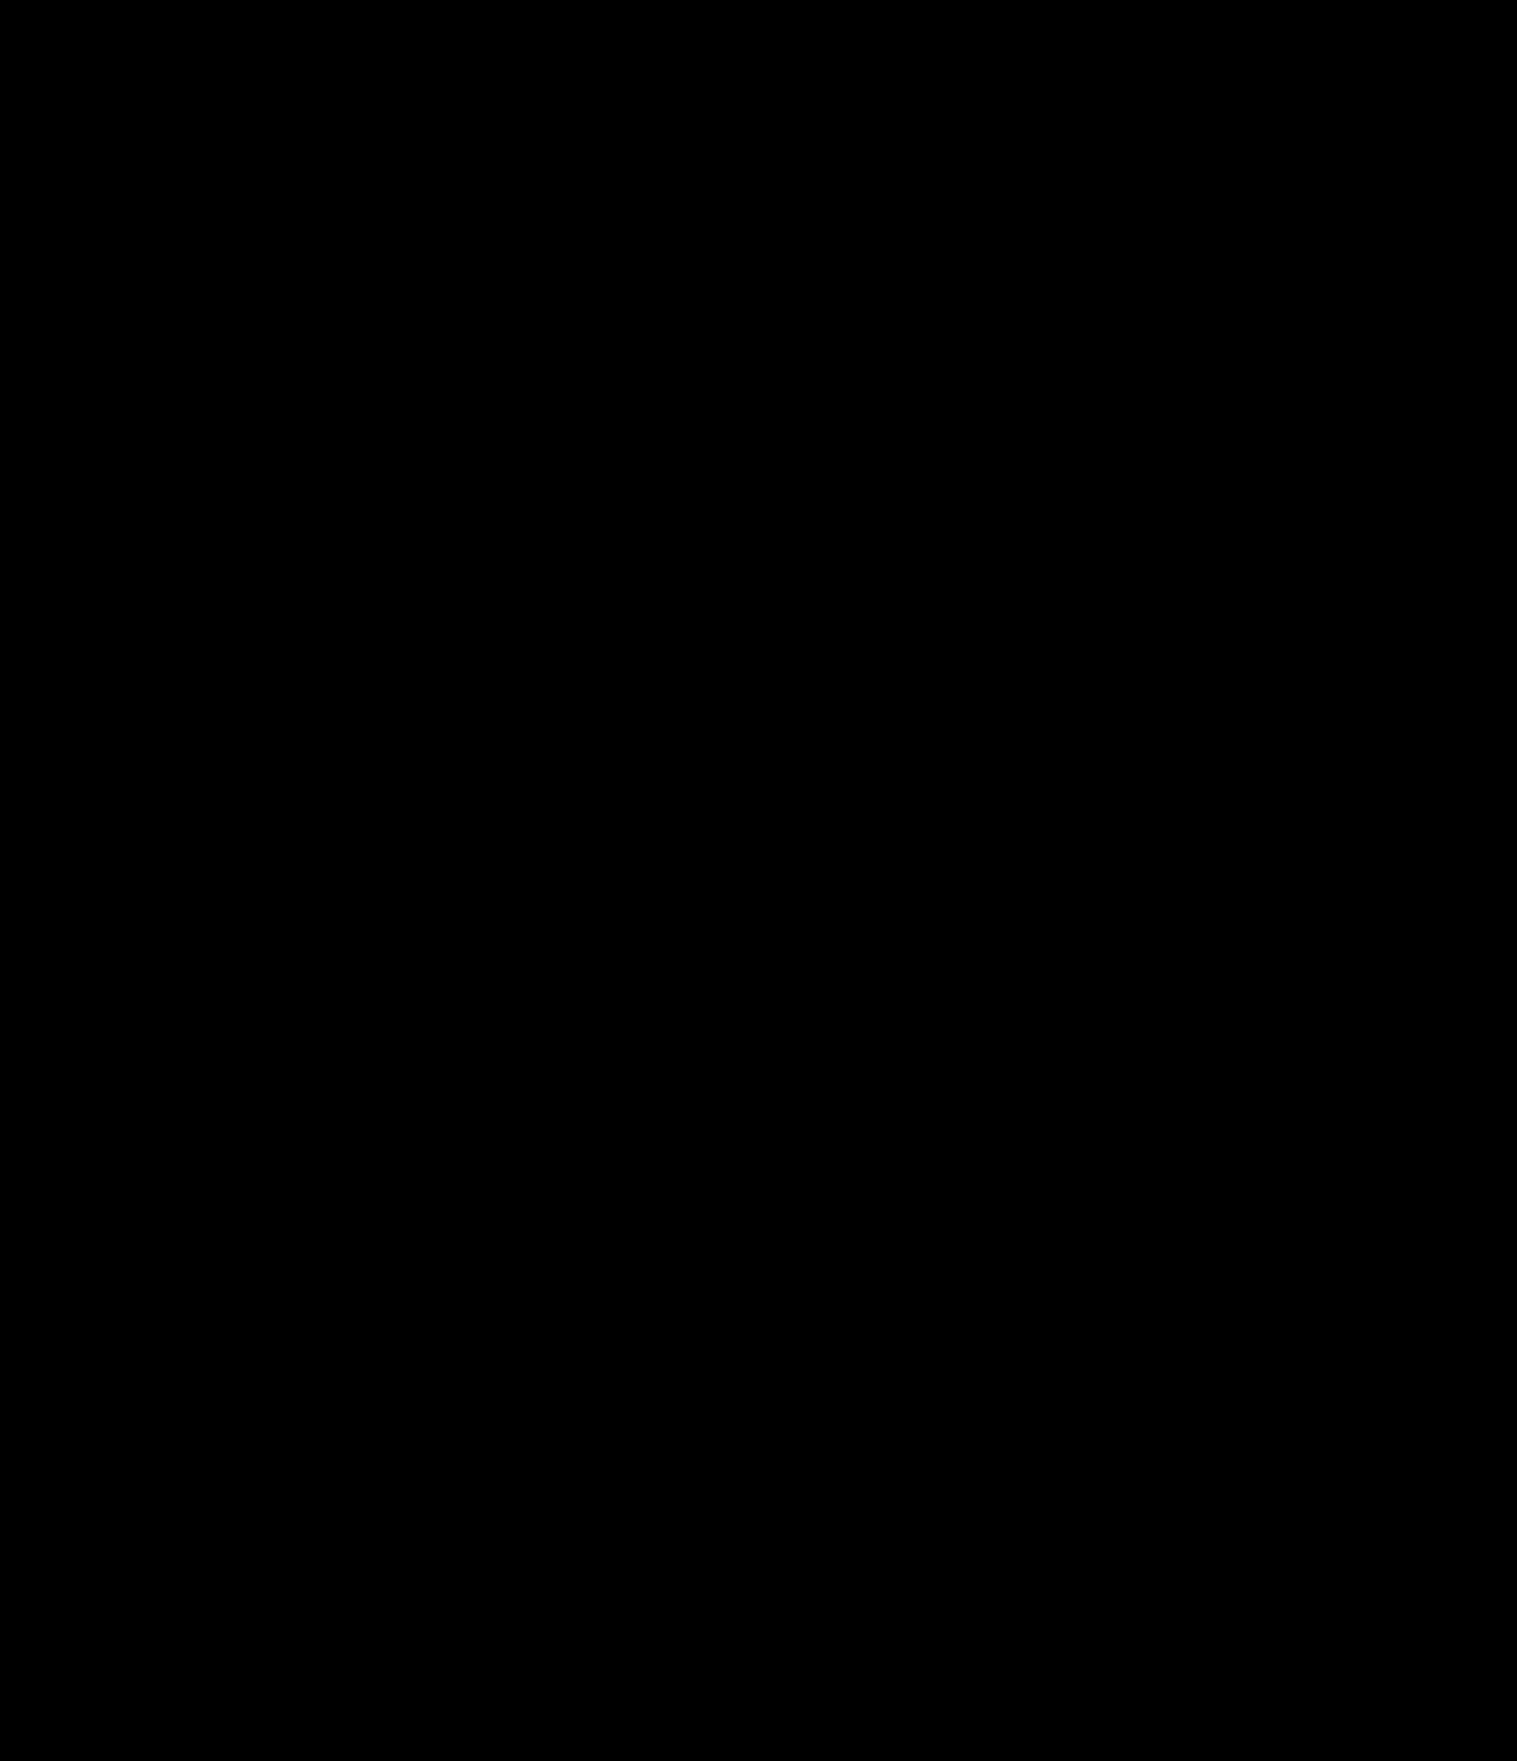 K6301